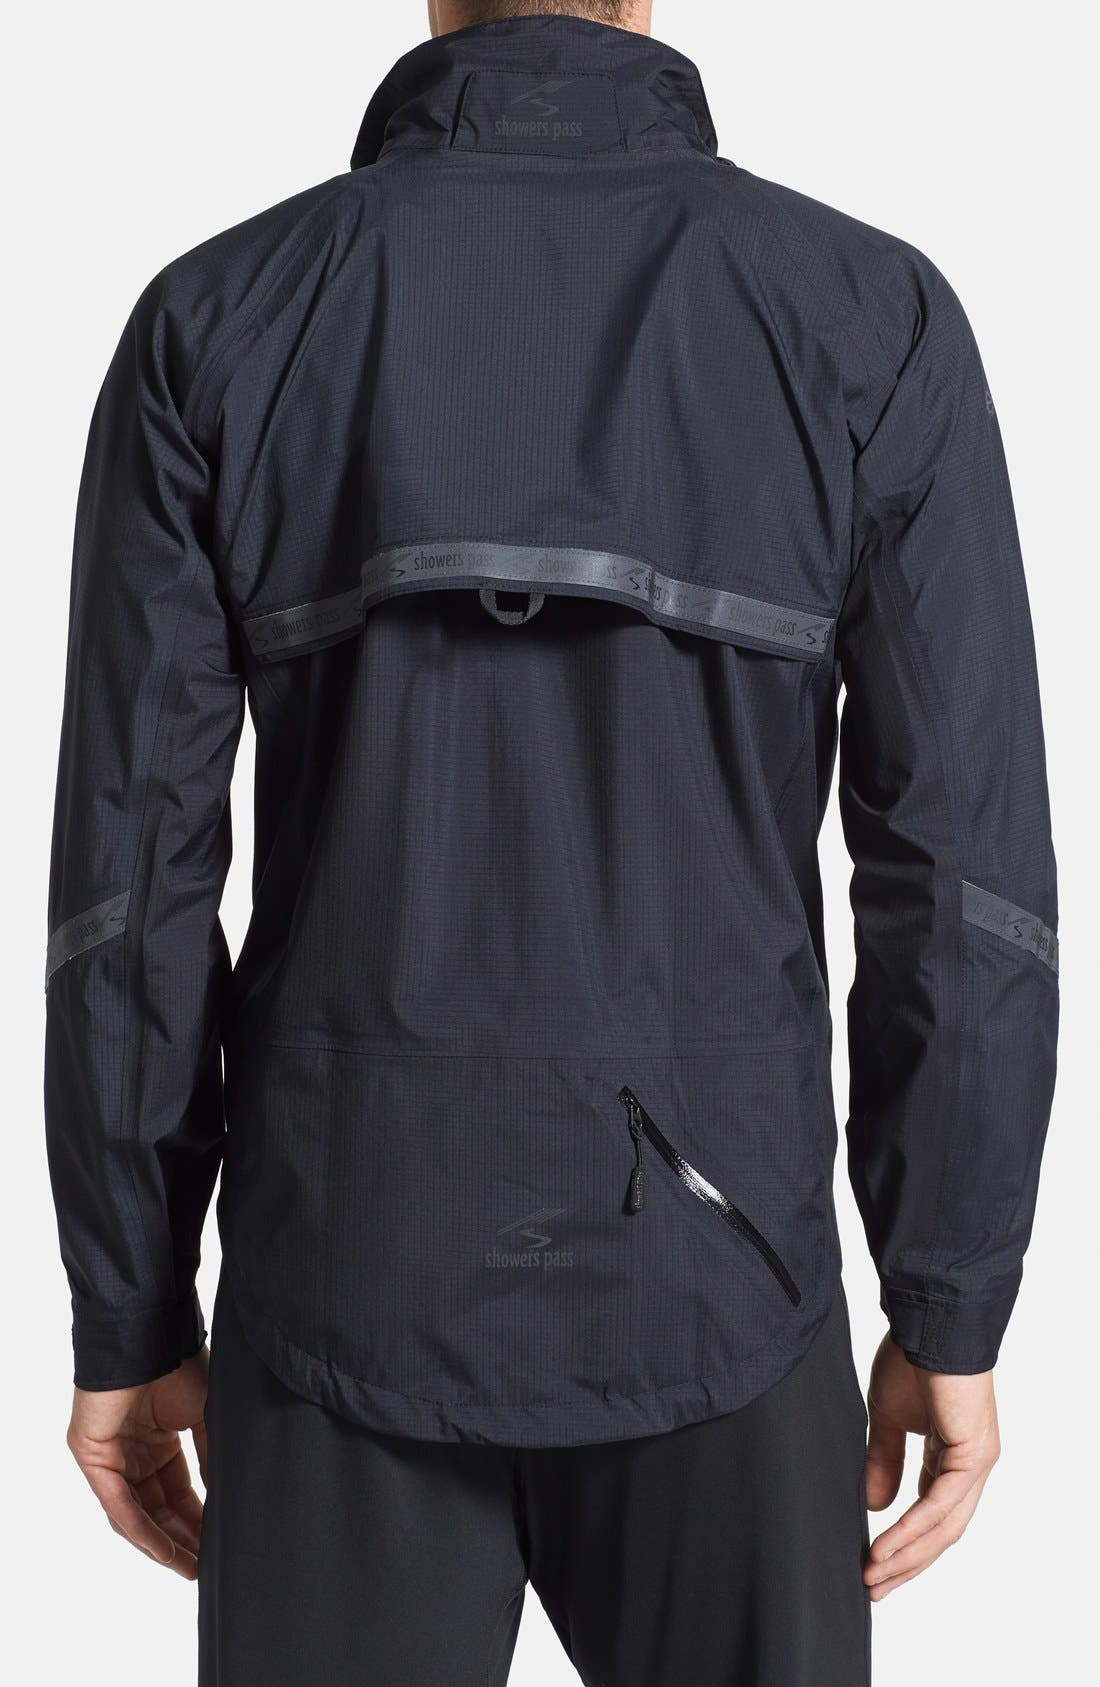 SHOWERS PASS,                             'Elite 2.1' Trim Fit Waterproof Hooded Jacket,                             Alternate thumbnail 4, color,                             001